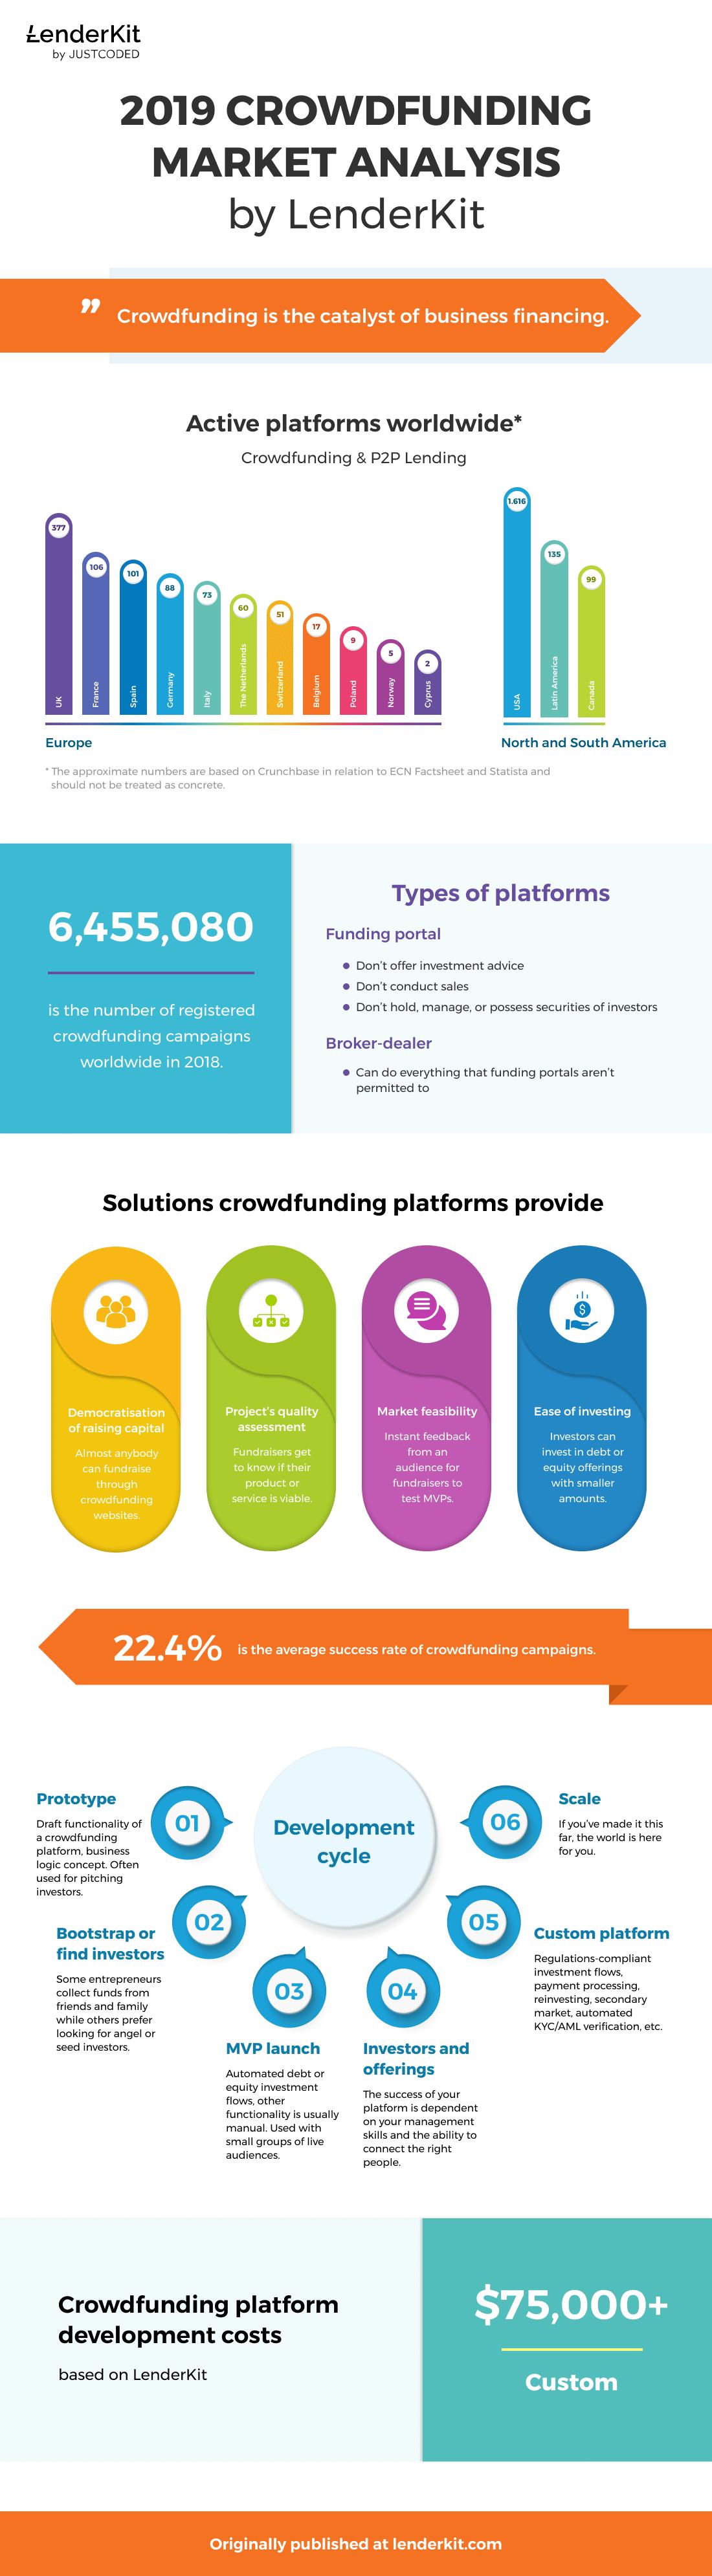 Lenderkit-Crowdfunding-Infographic-1